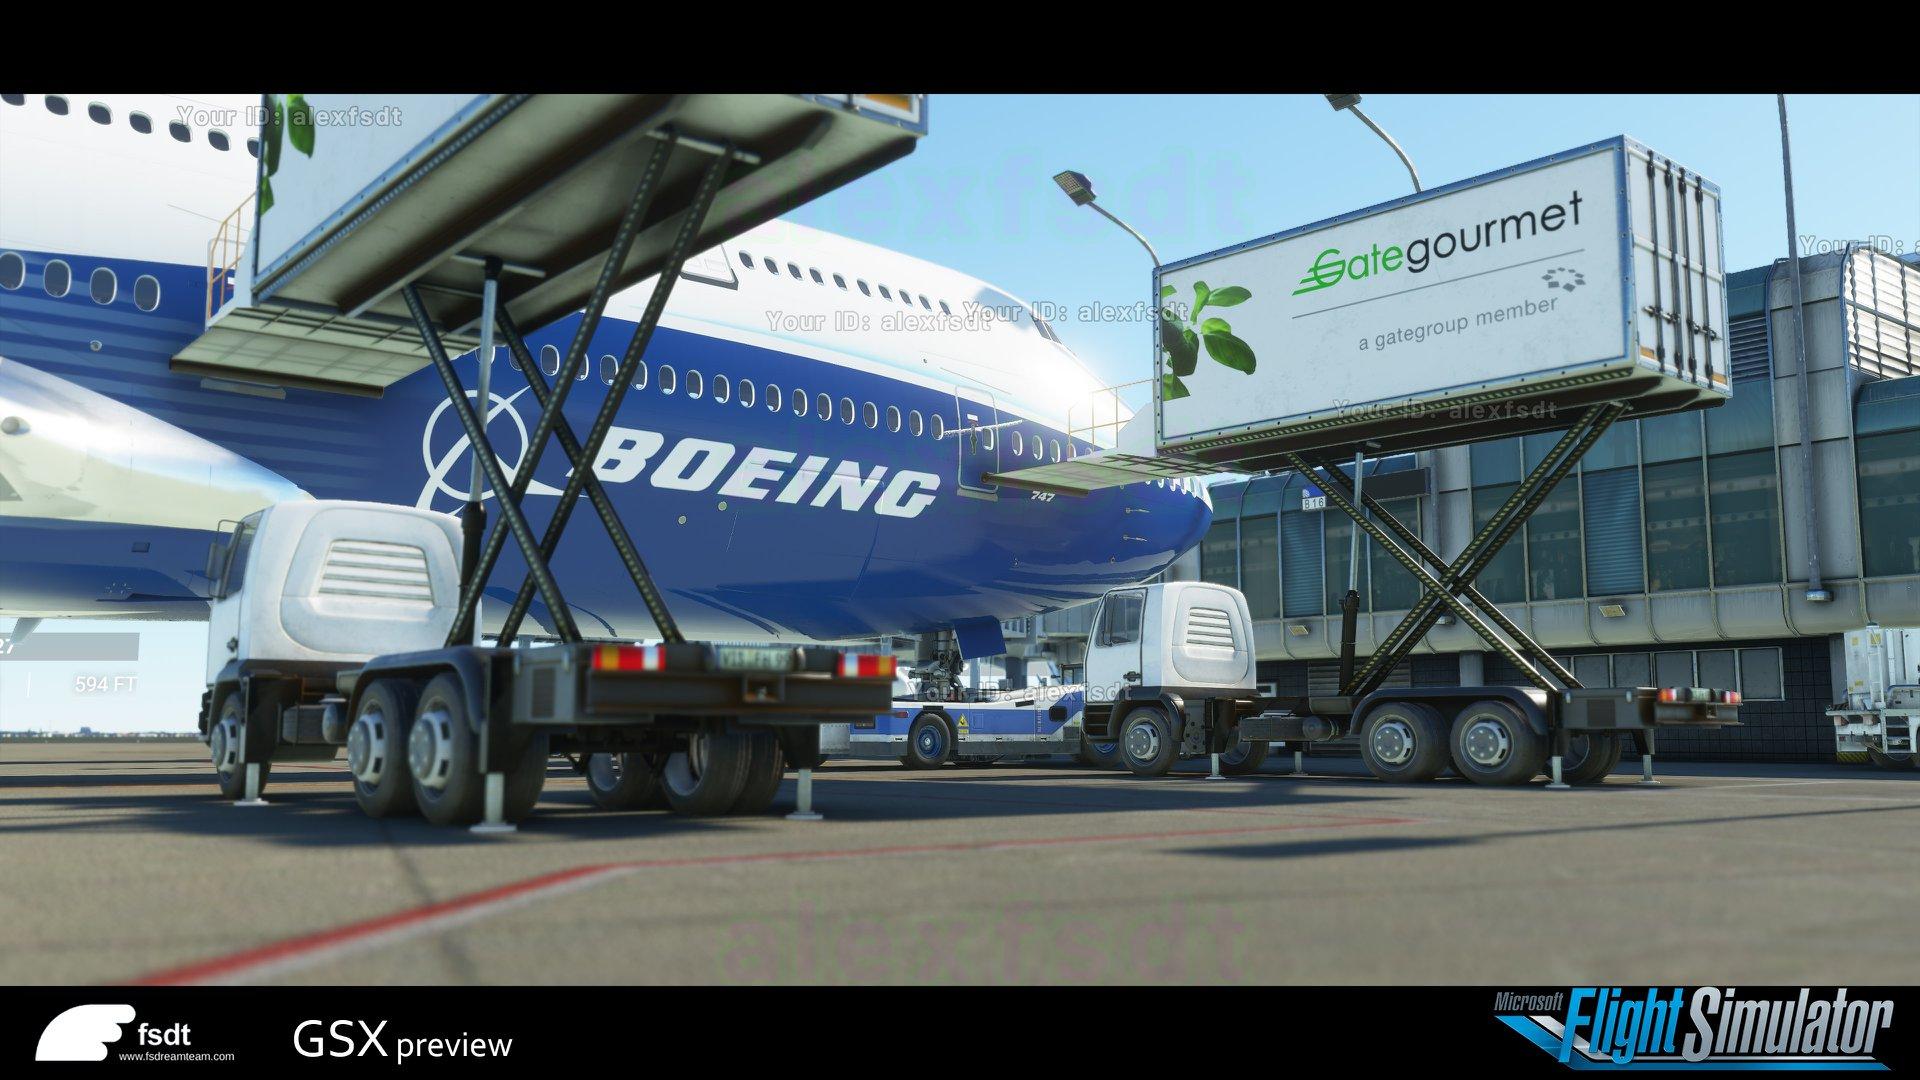 FSDreamTeam y FS2Crew Presentan Ground Services X(GSX) y pushback Express para Microsoft Flight Simulator